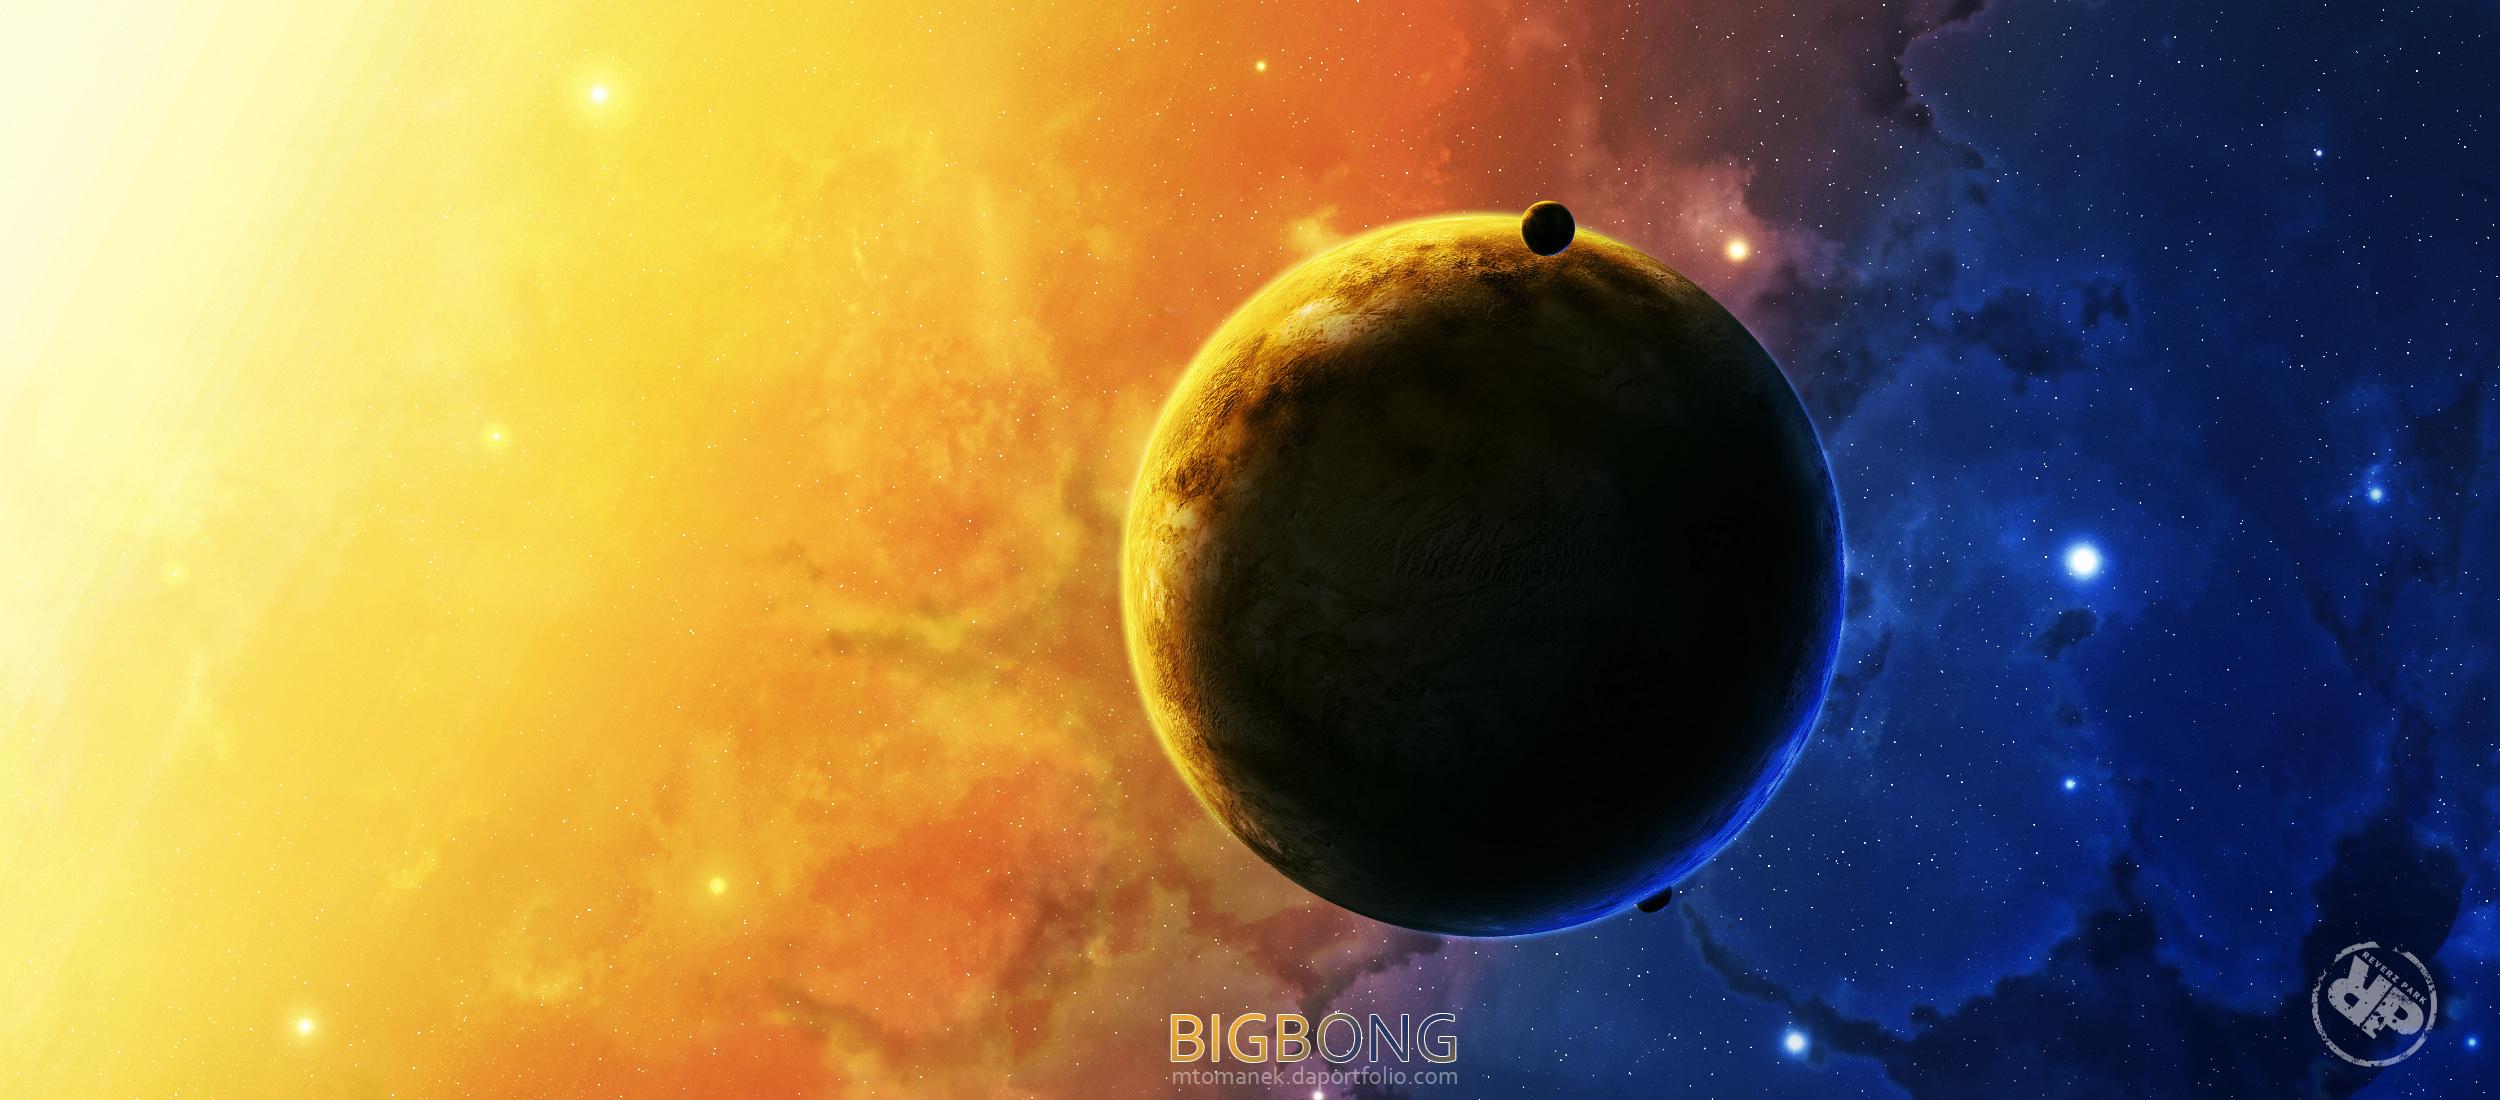 BigBong Song by PhobosKE